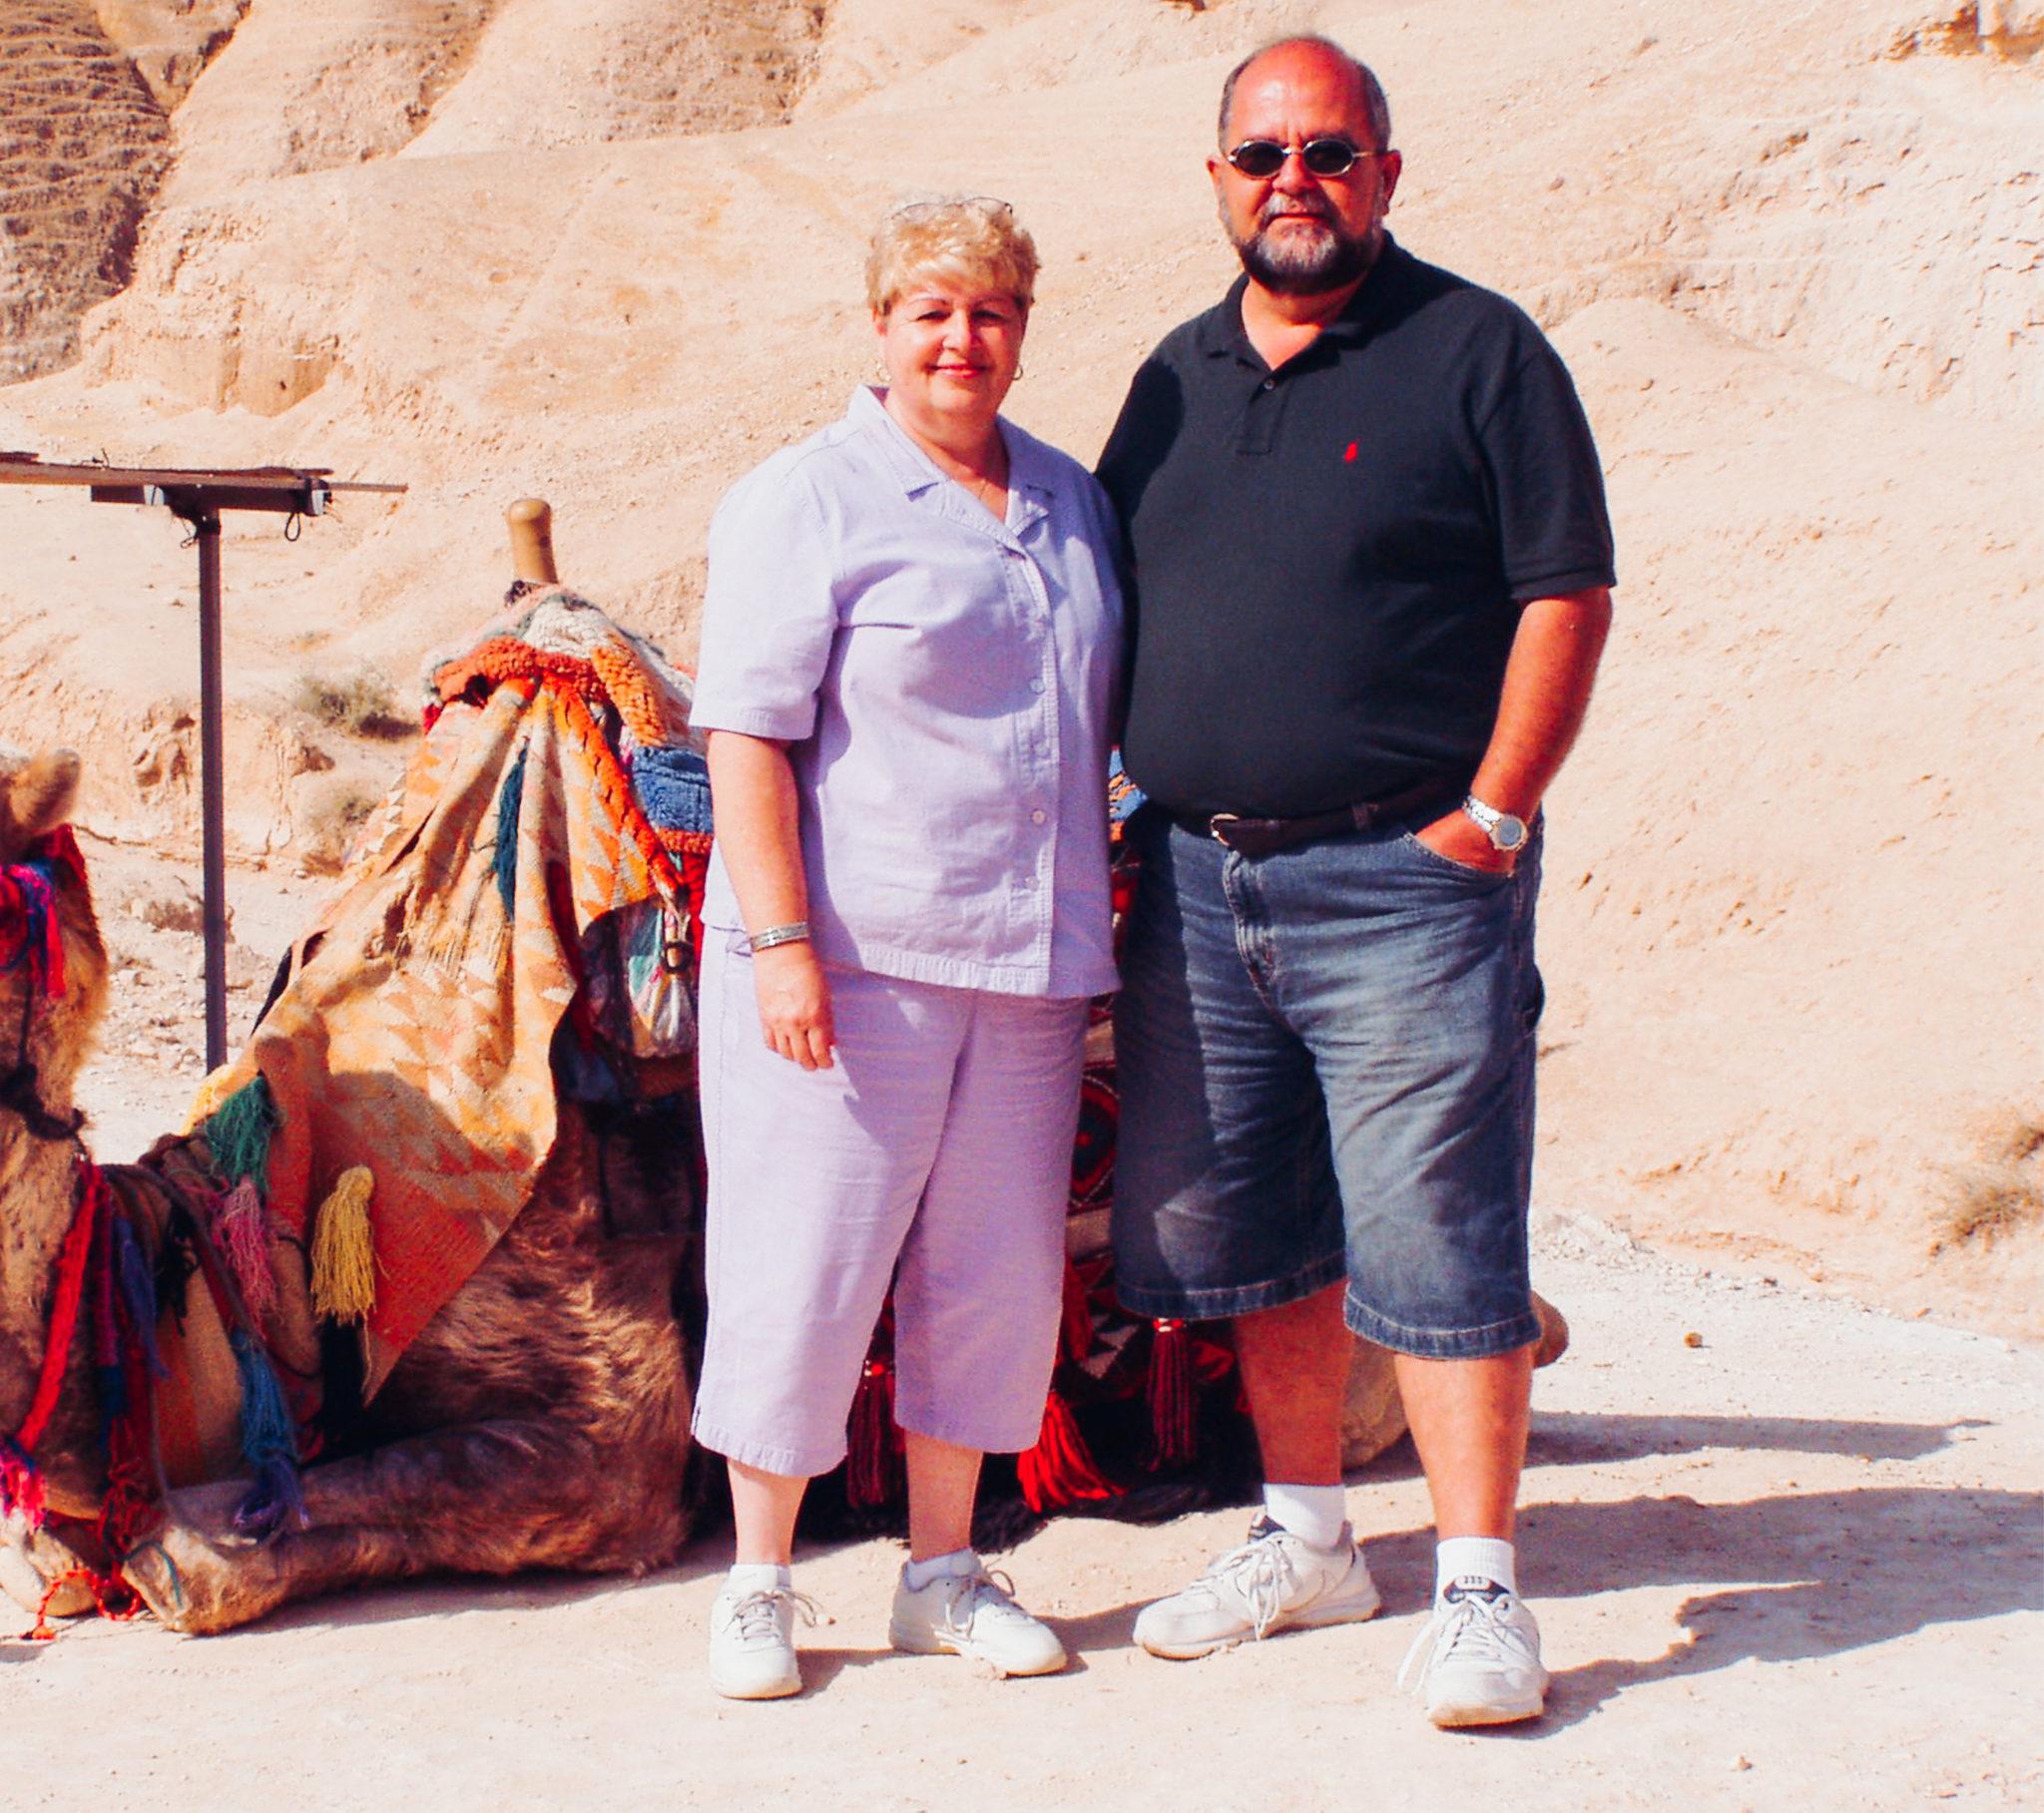 Missionaries to Israel